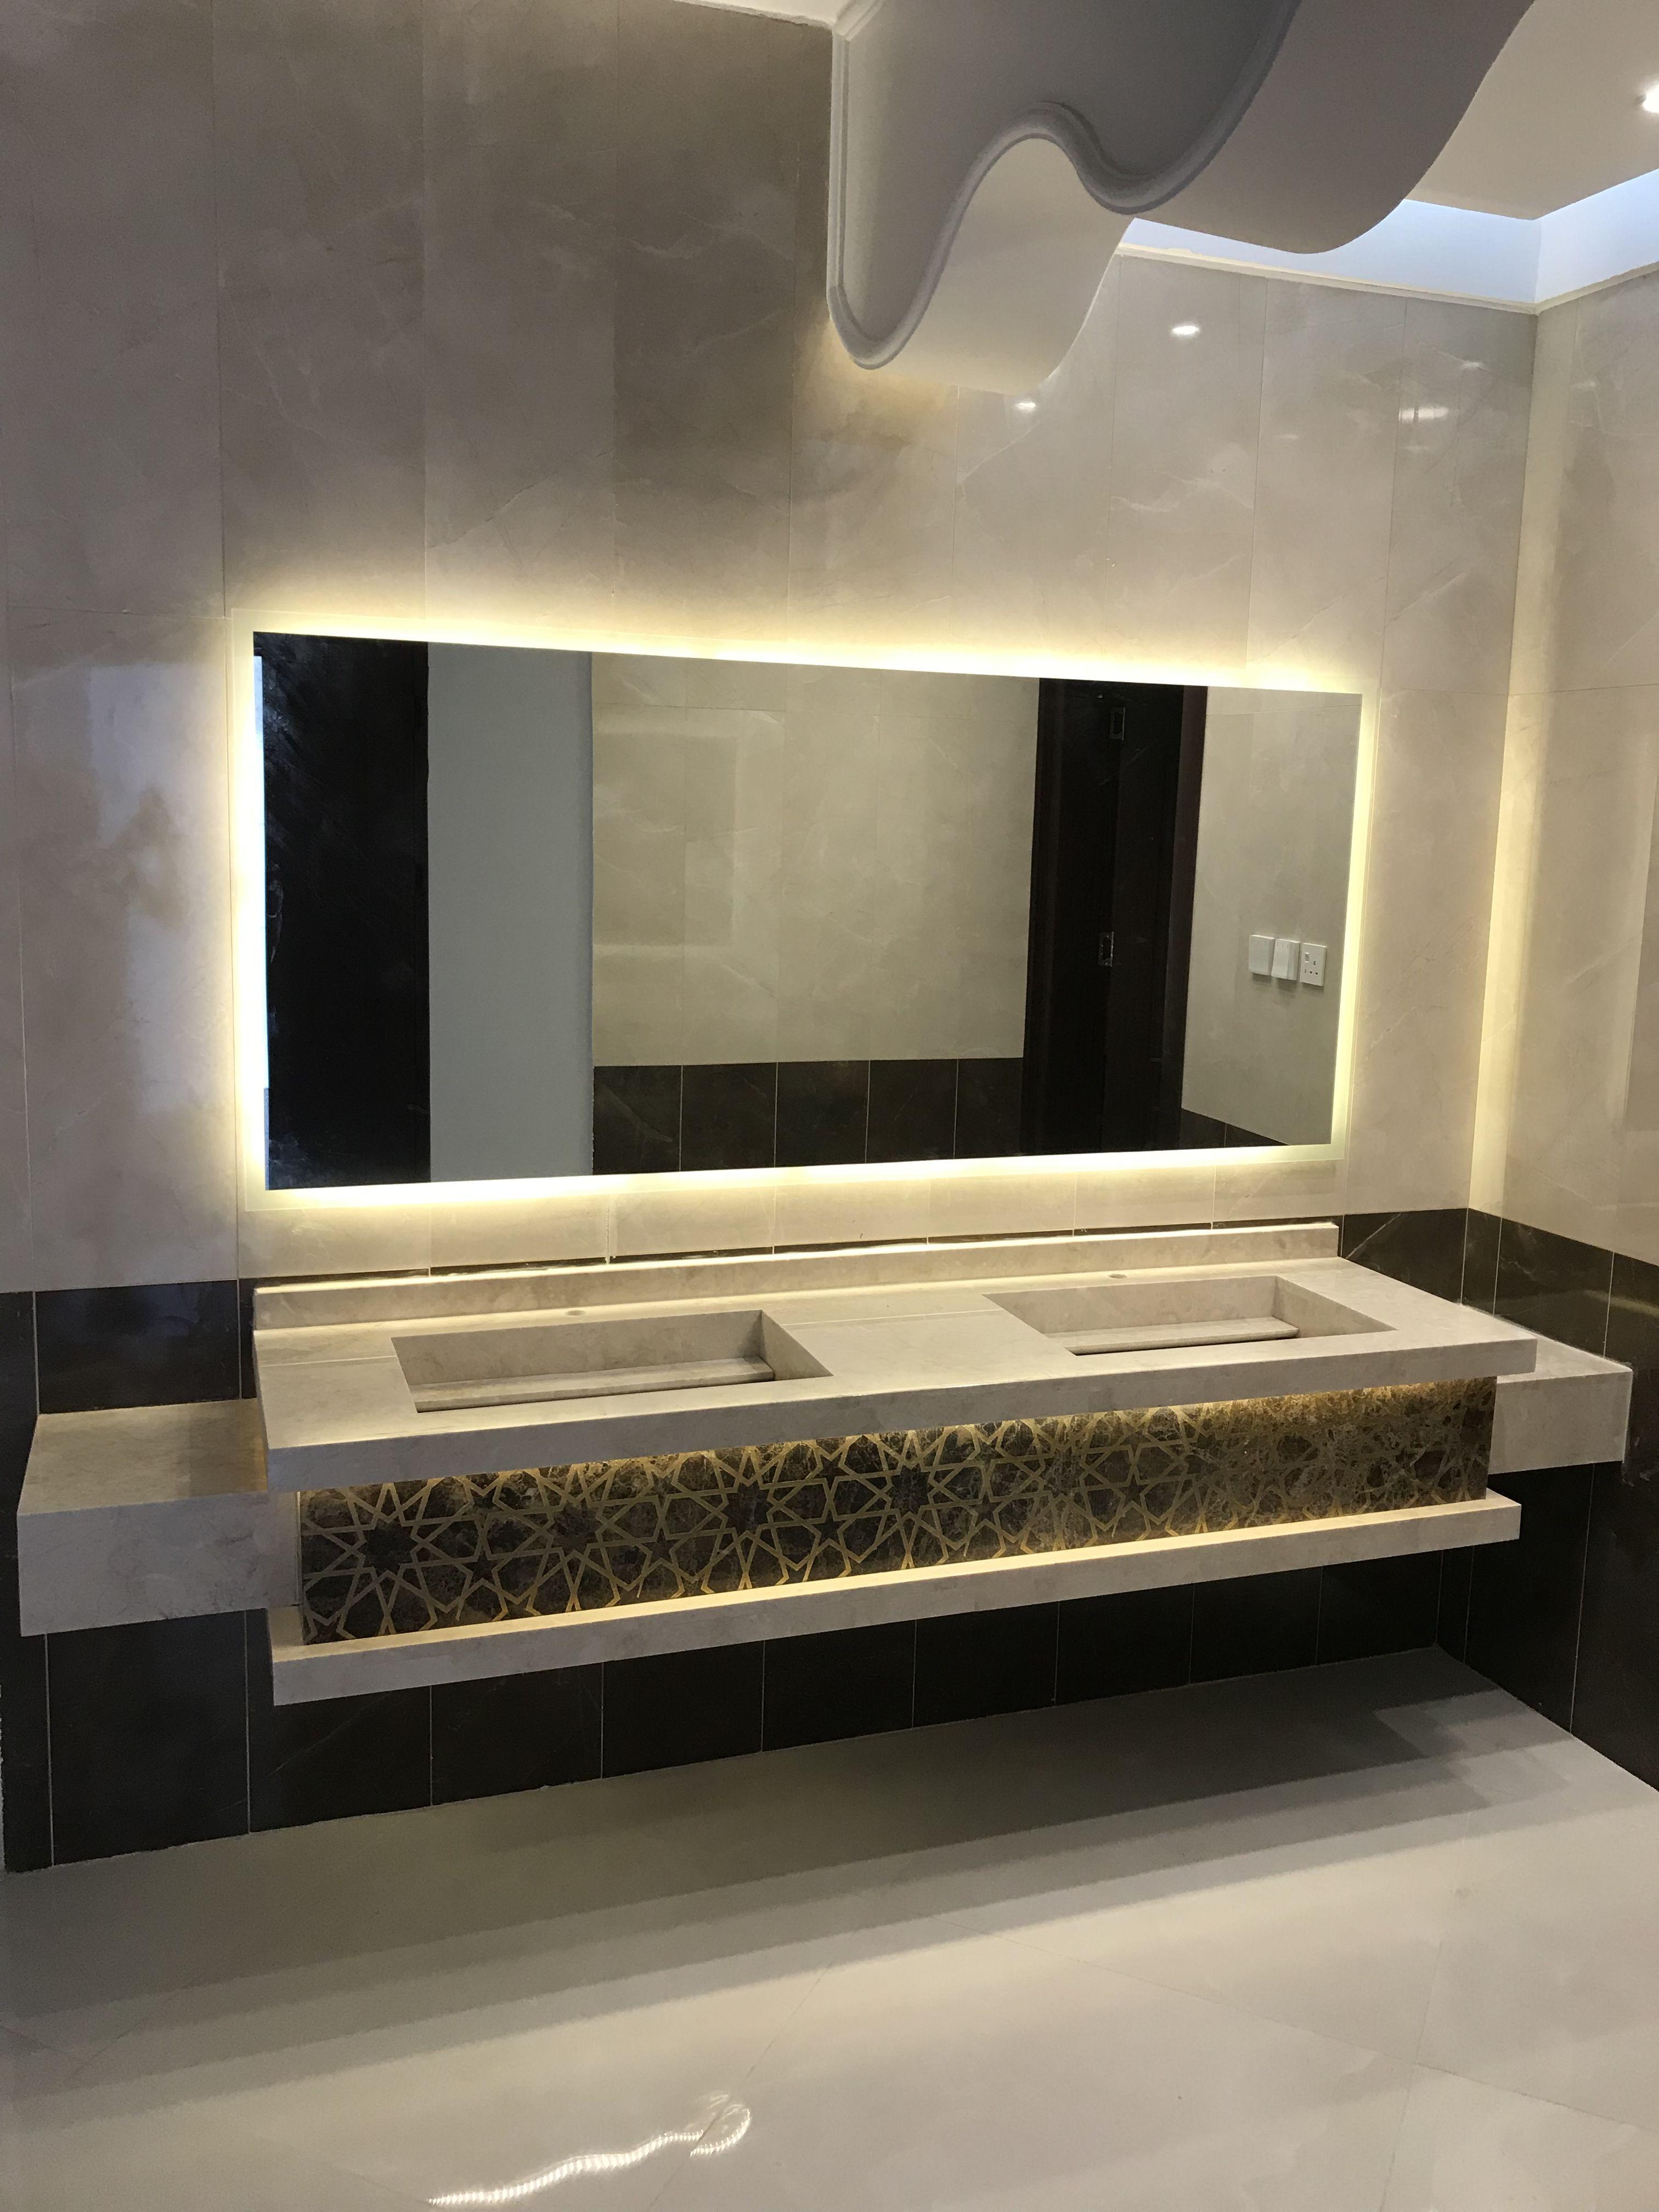 Pin By Kent Leoni On مغاسل Led Mirror Bathroom Hallway Designs Home Decor